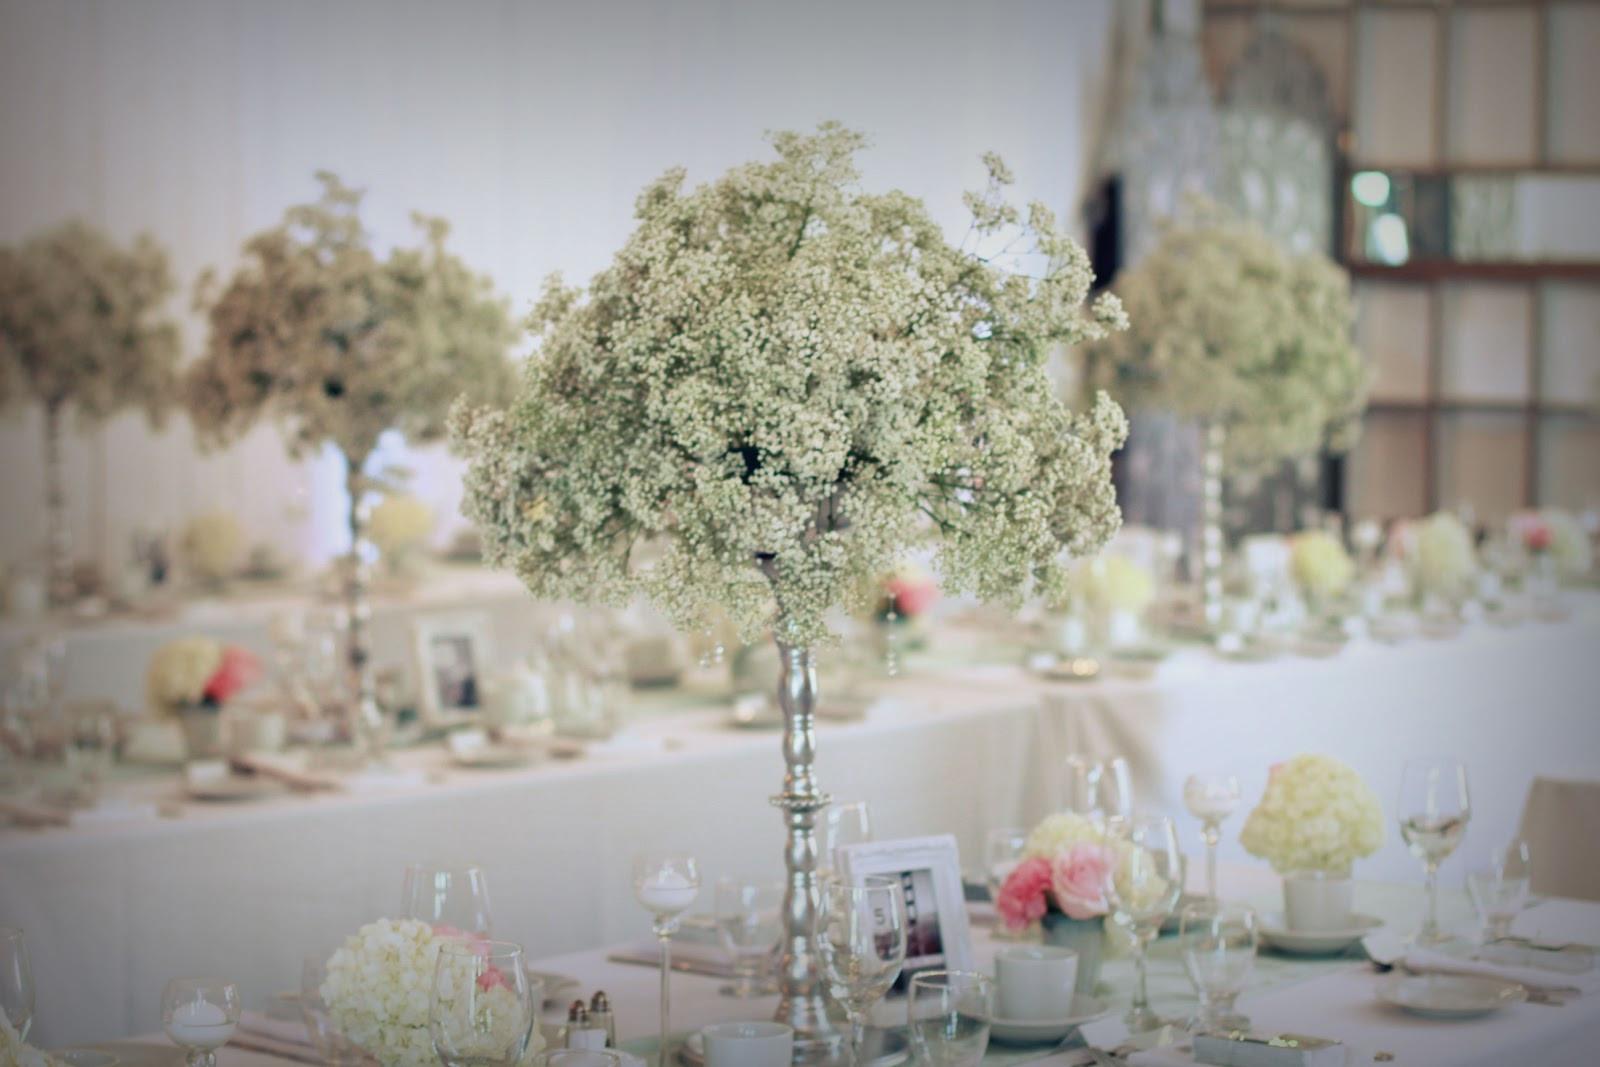 Best ideas about DIY Wedding Centerpieces . Save or Pin DIY Wedding Centerpieces Now.